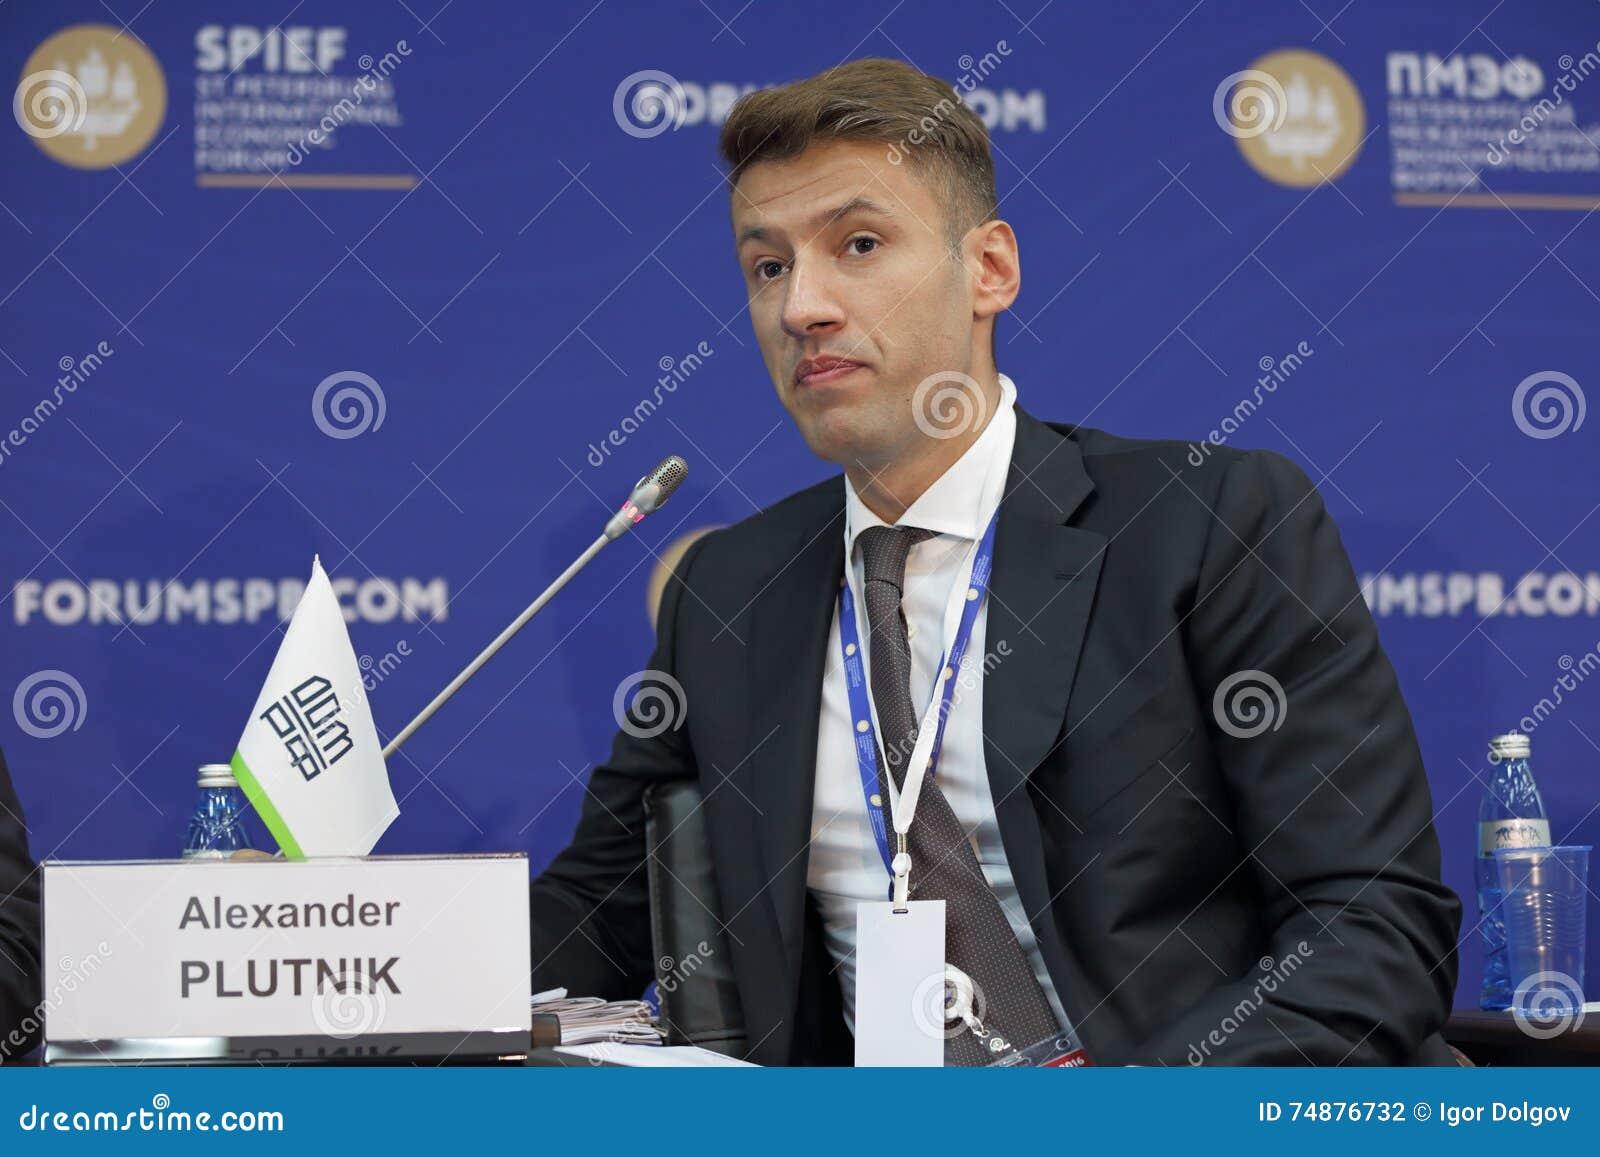 Alexander Plutnik